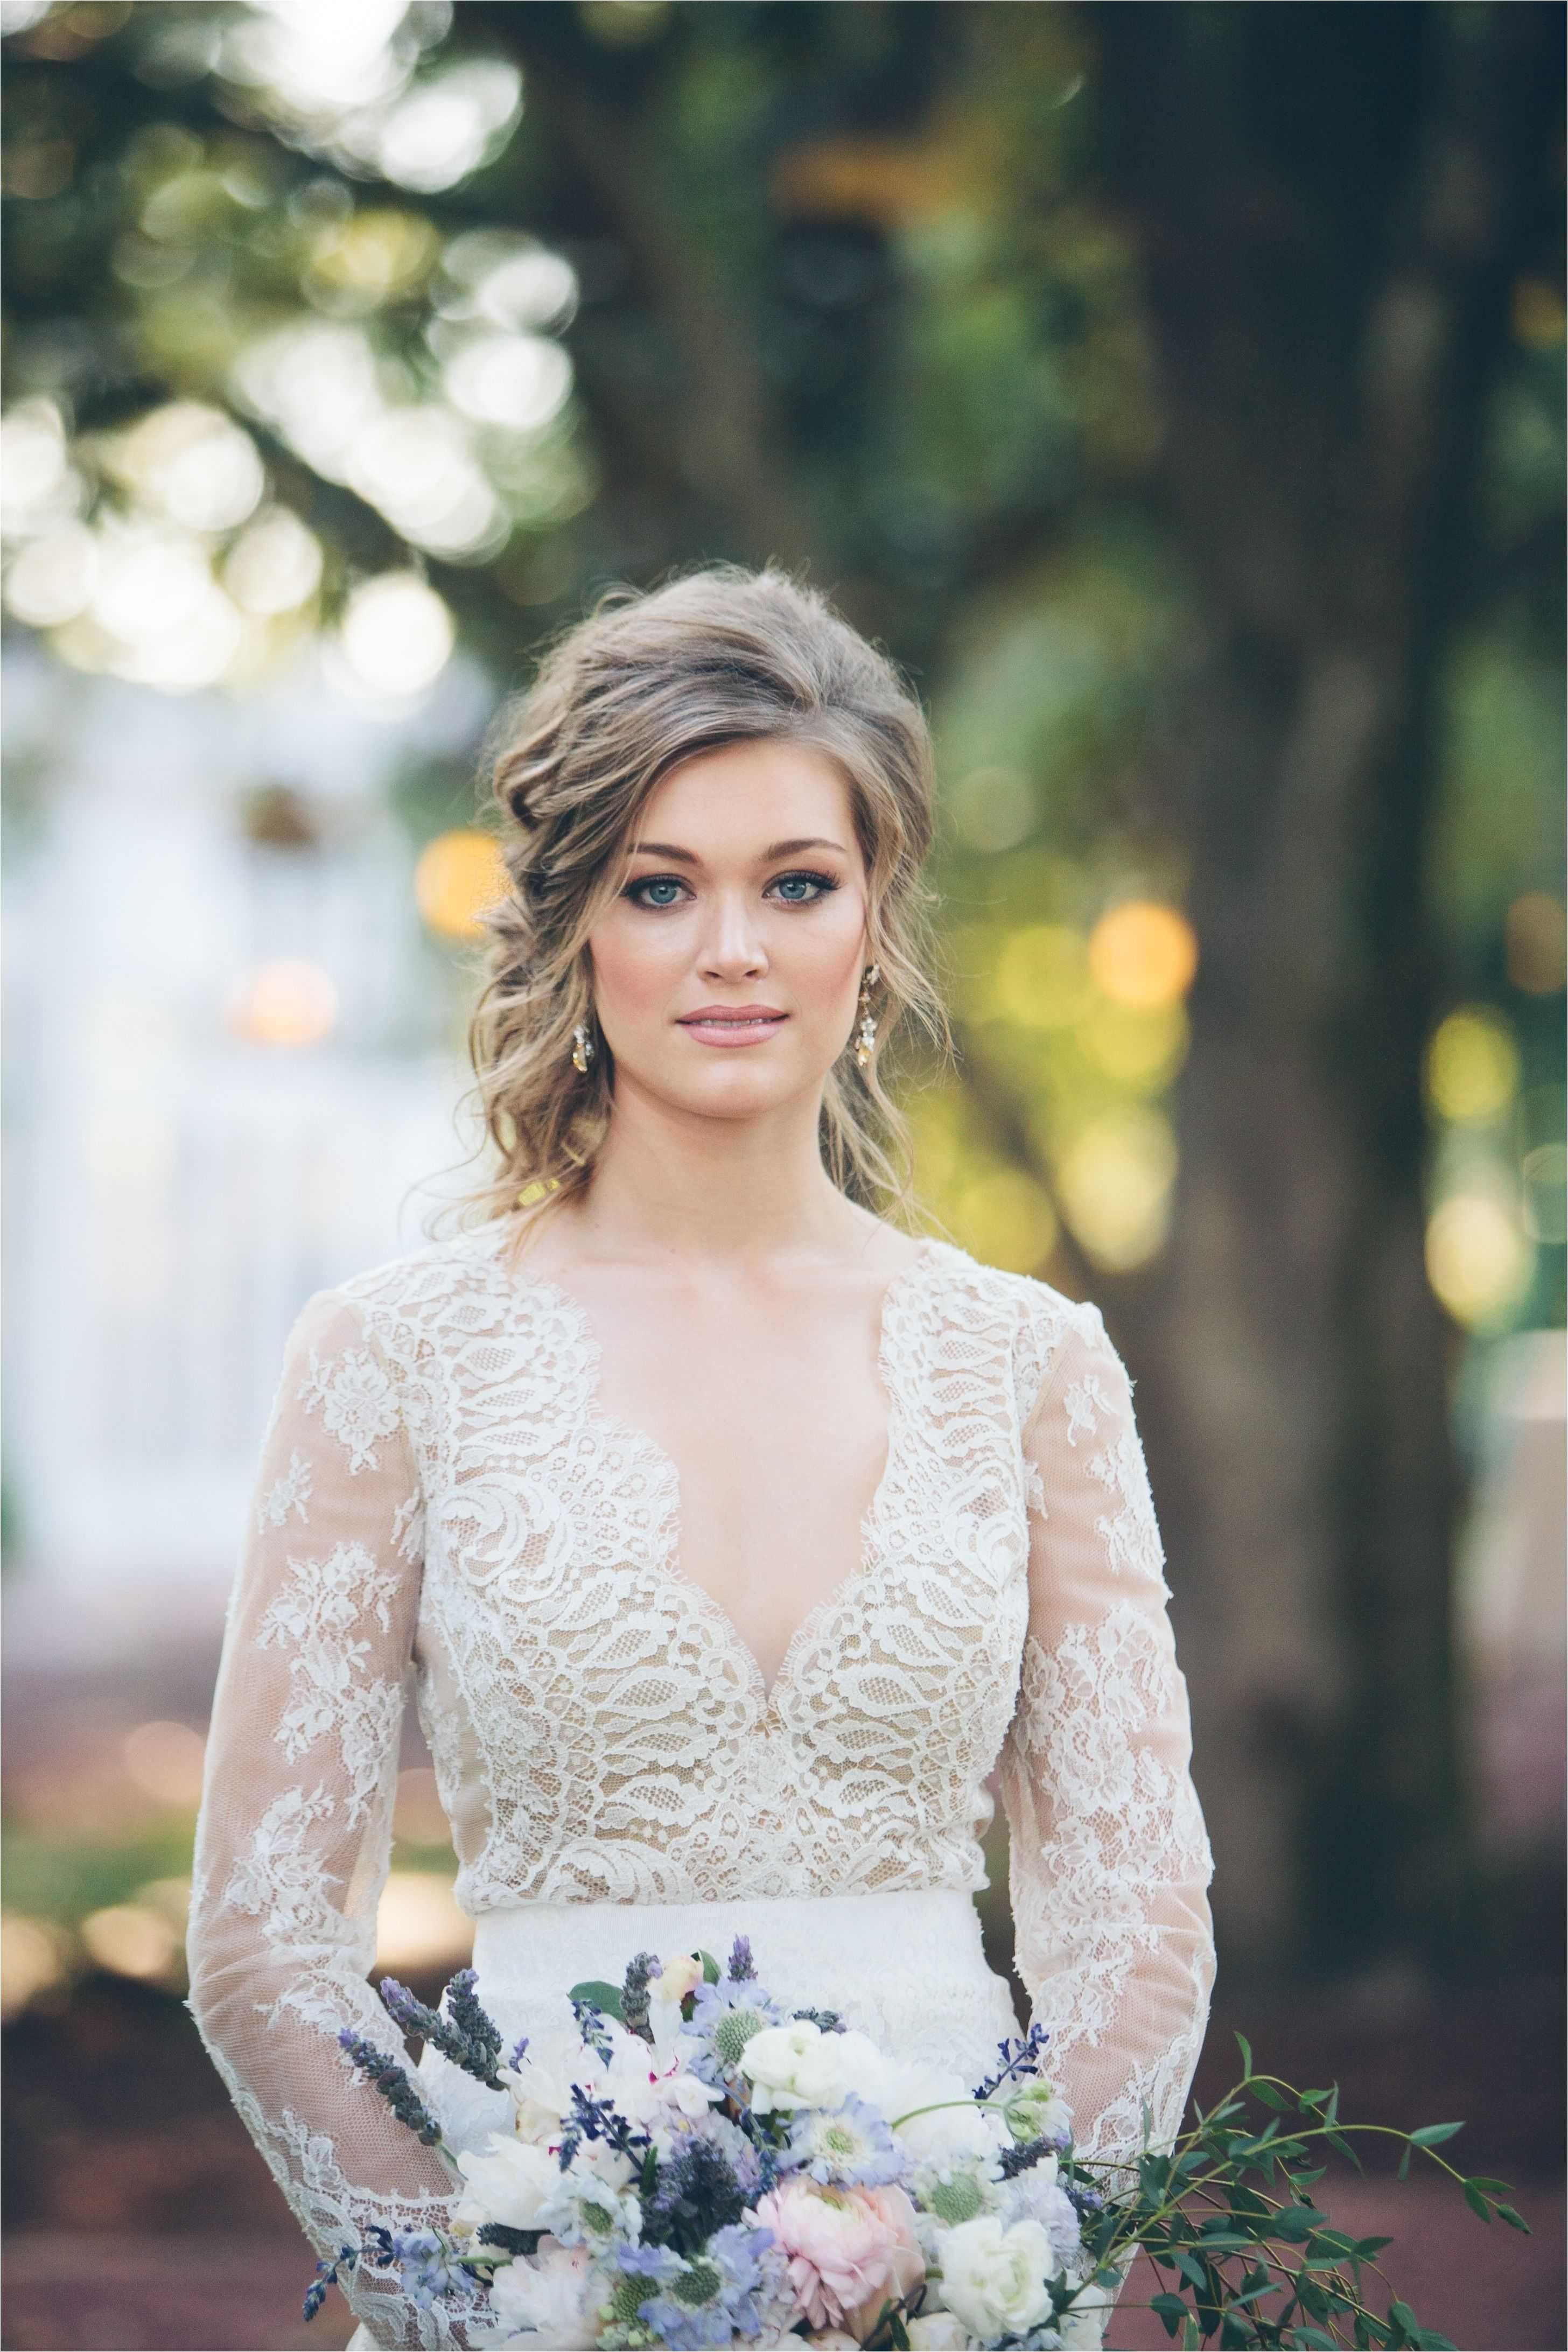 Hairstyles for An Elegant Dress Wedding Hairstyles for Backless Dresses Awesome Wedding Hairstyles